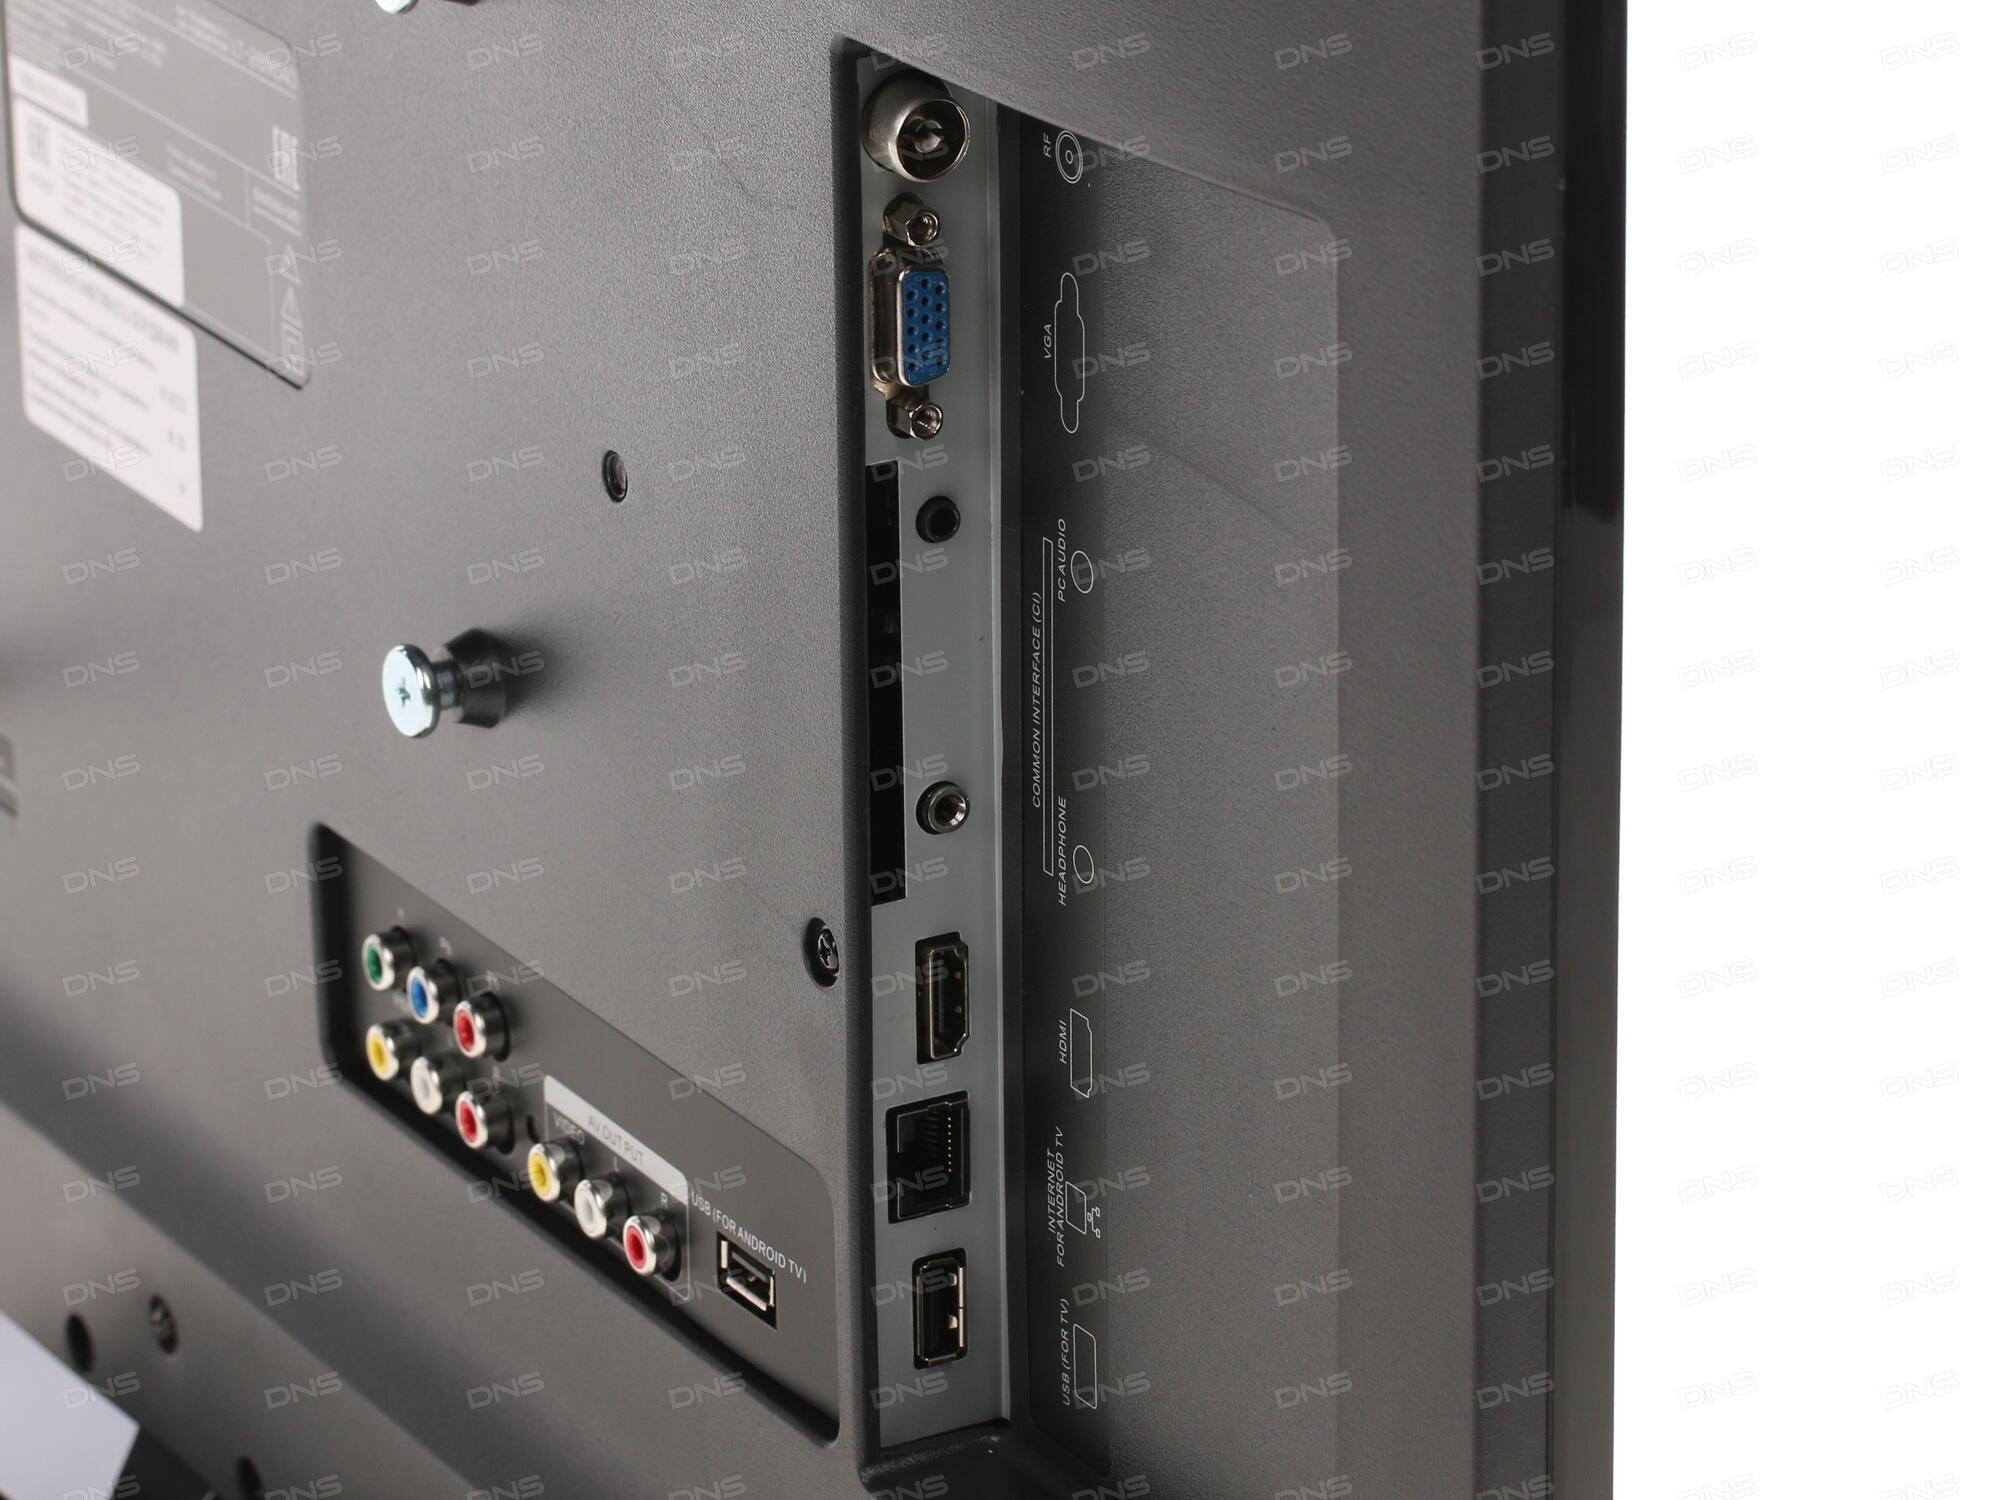 jvc lt-28m540 отзывы Телевизор JVC LT-32M540 распаковка и комплект - YouTube